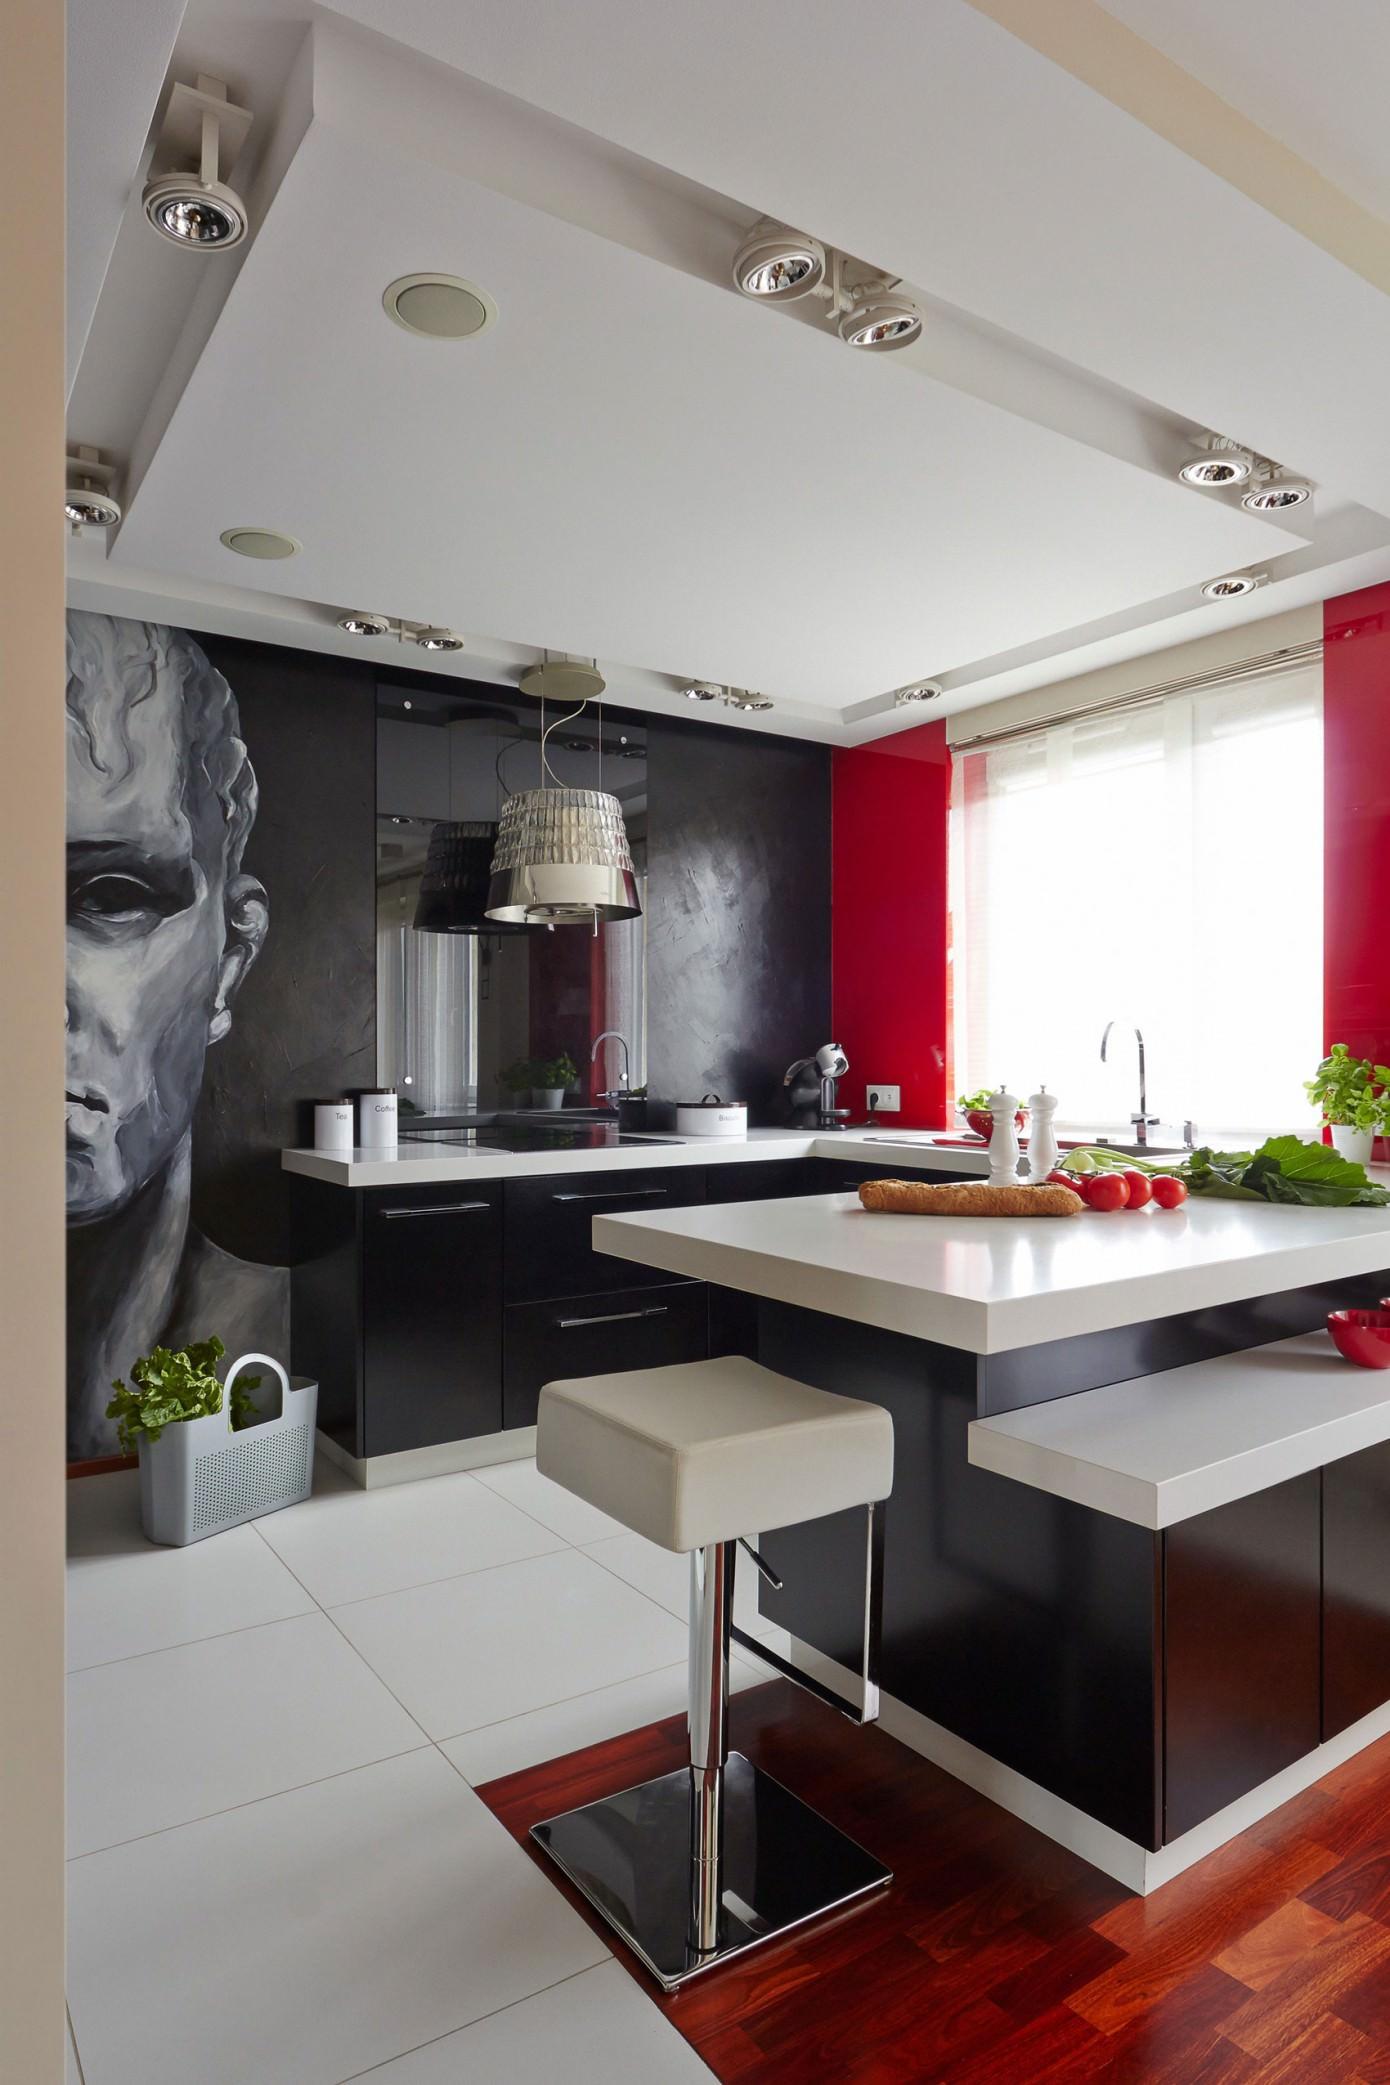 M09 Residence by Widawscy Studio Architektury